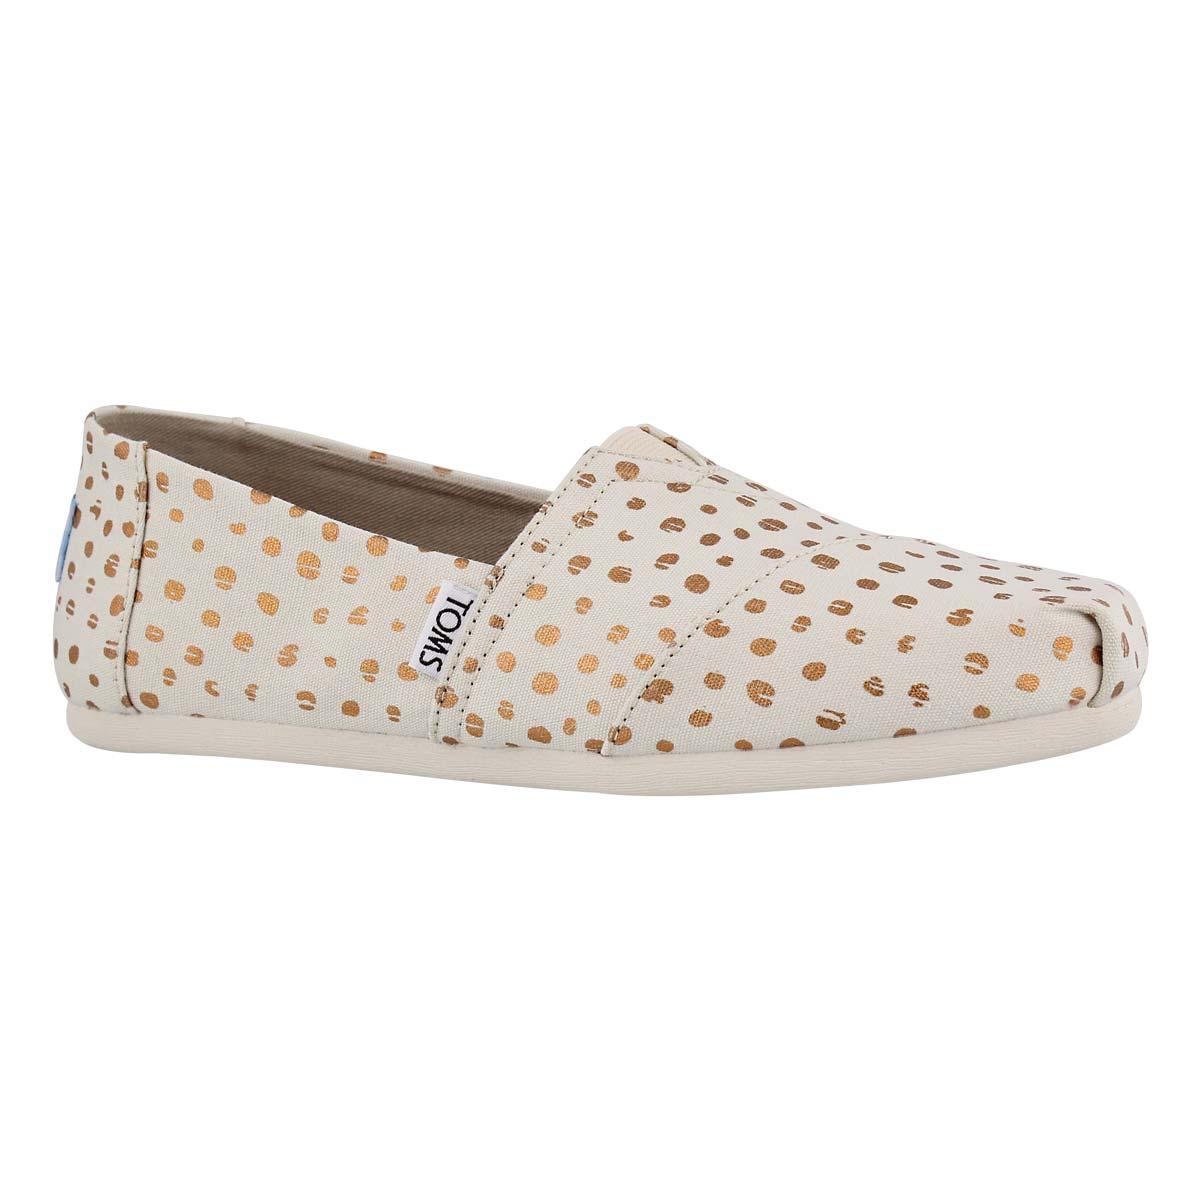 Women's SEASONAL CLASSIC natural dot loafers